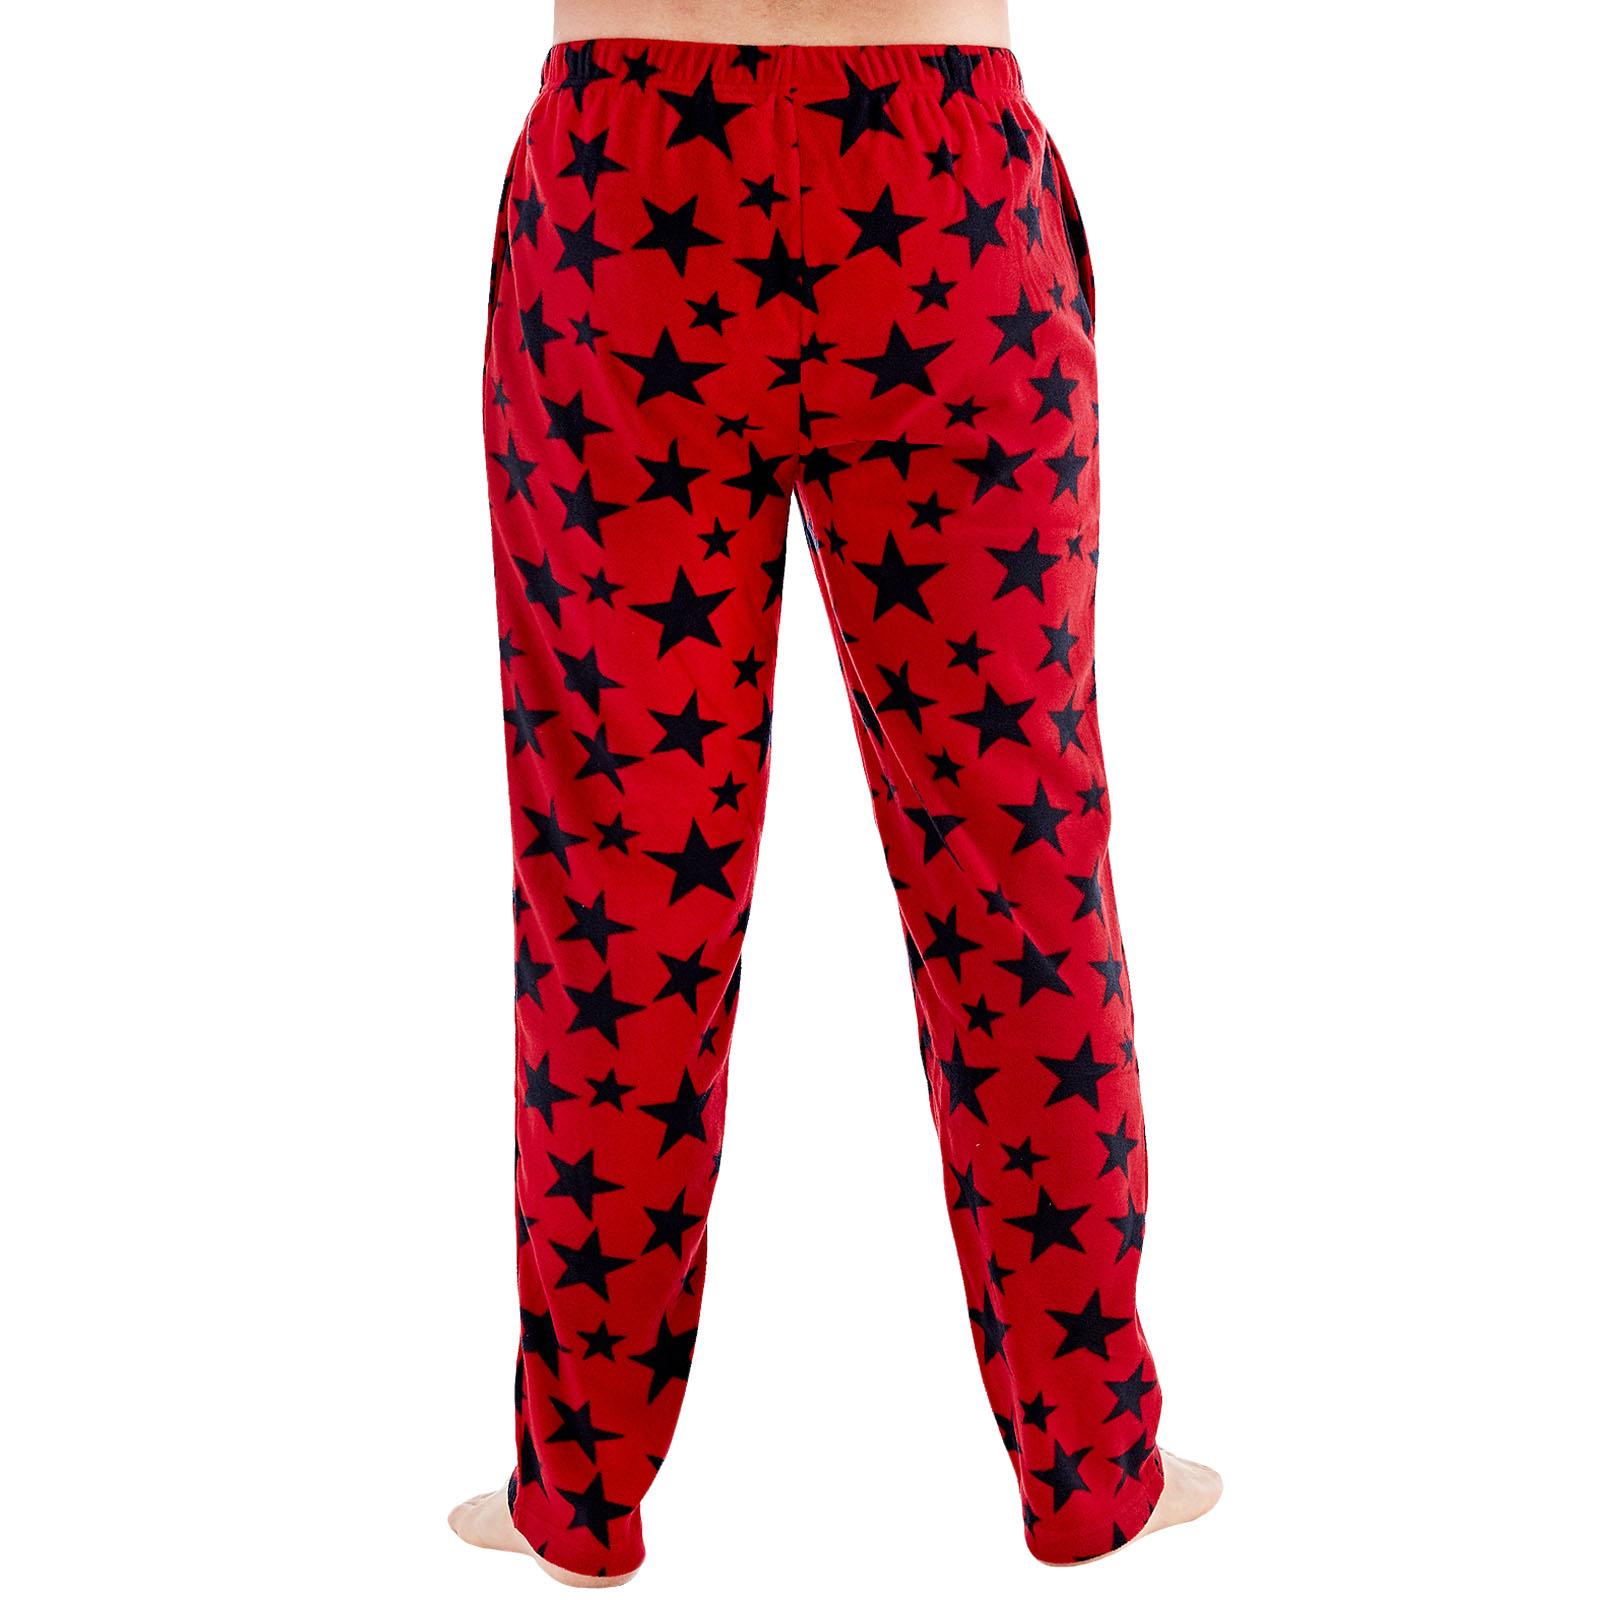 Harvey-James-Mens-Star-Fleece-Pyjama-Bottoms-Loungewear-Pants-Trousers Indexbild 5